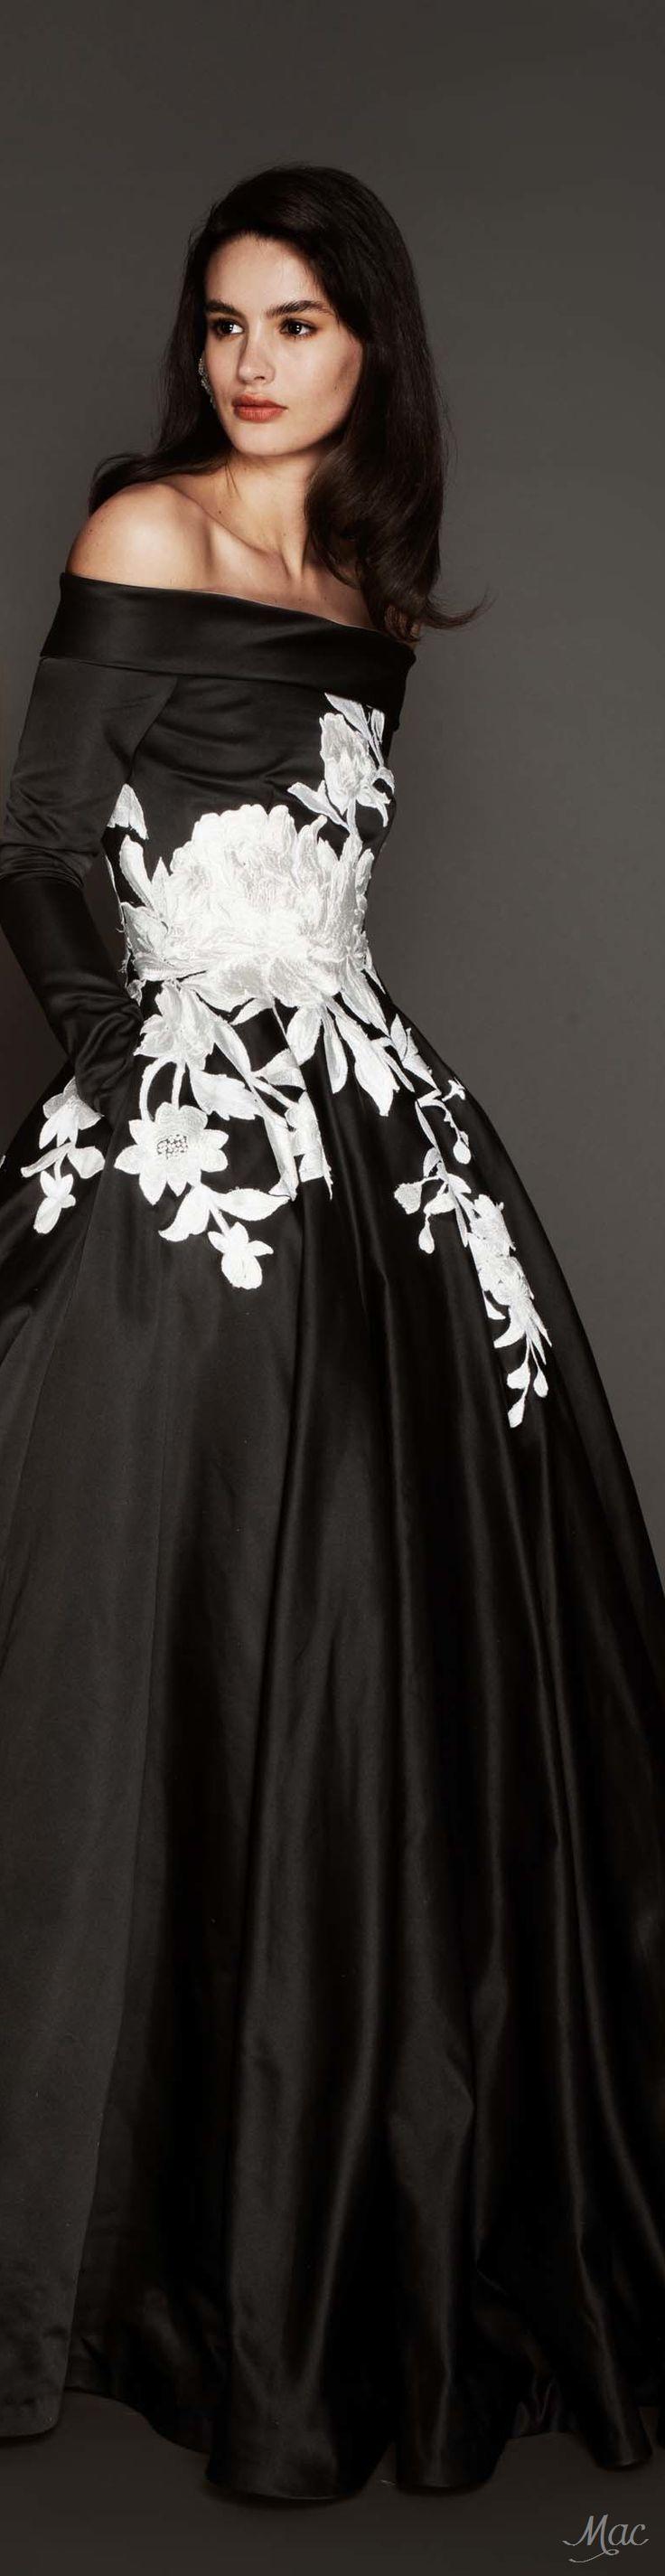 best идеи с подиума images on pinterest formal prom dresses